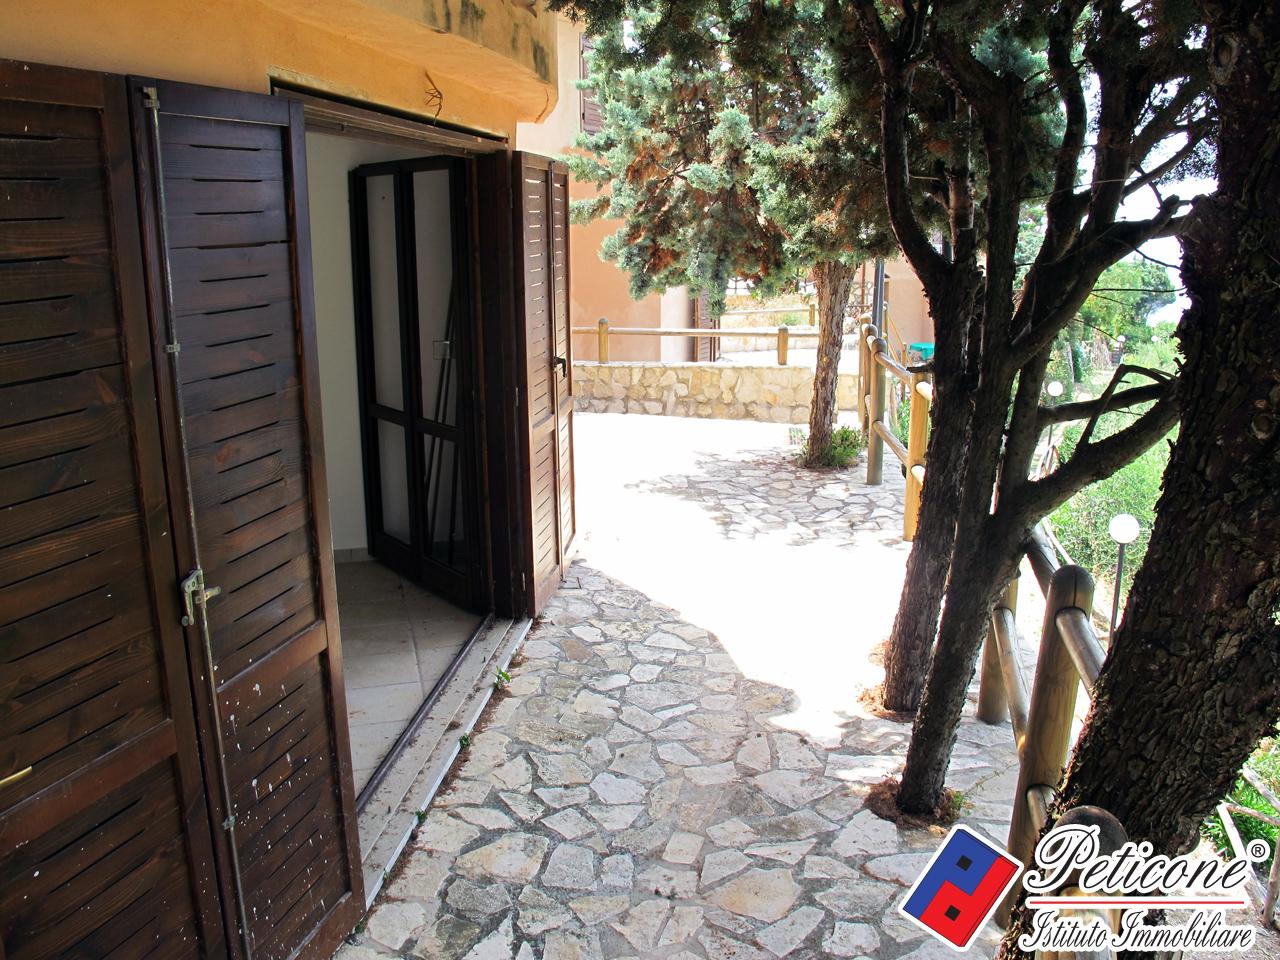 Appartamento in Vendita a Sperlonga: 1 locali, 45 mq - Foto 2